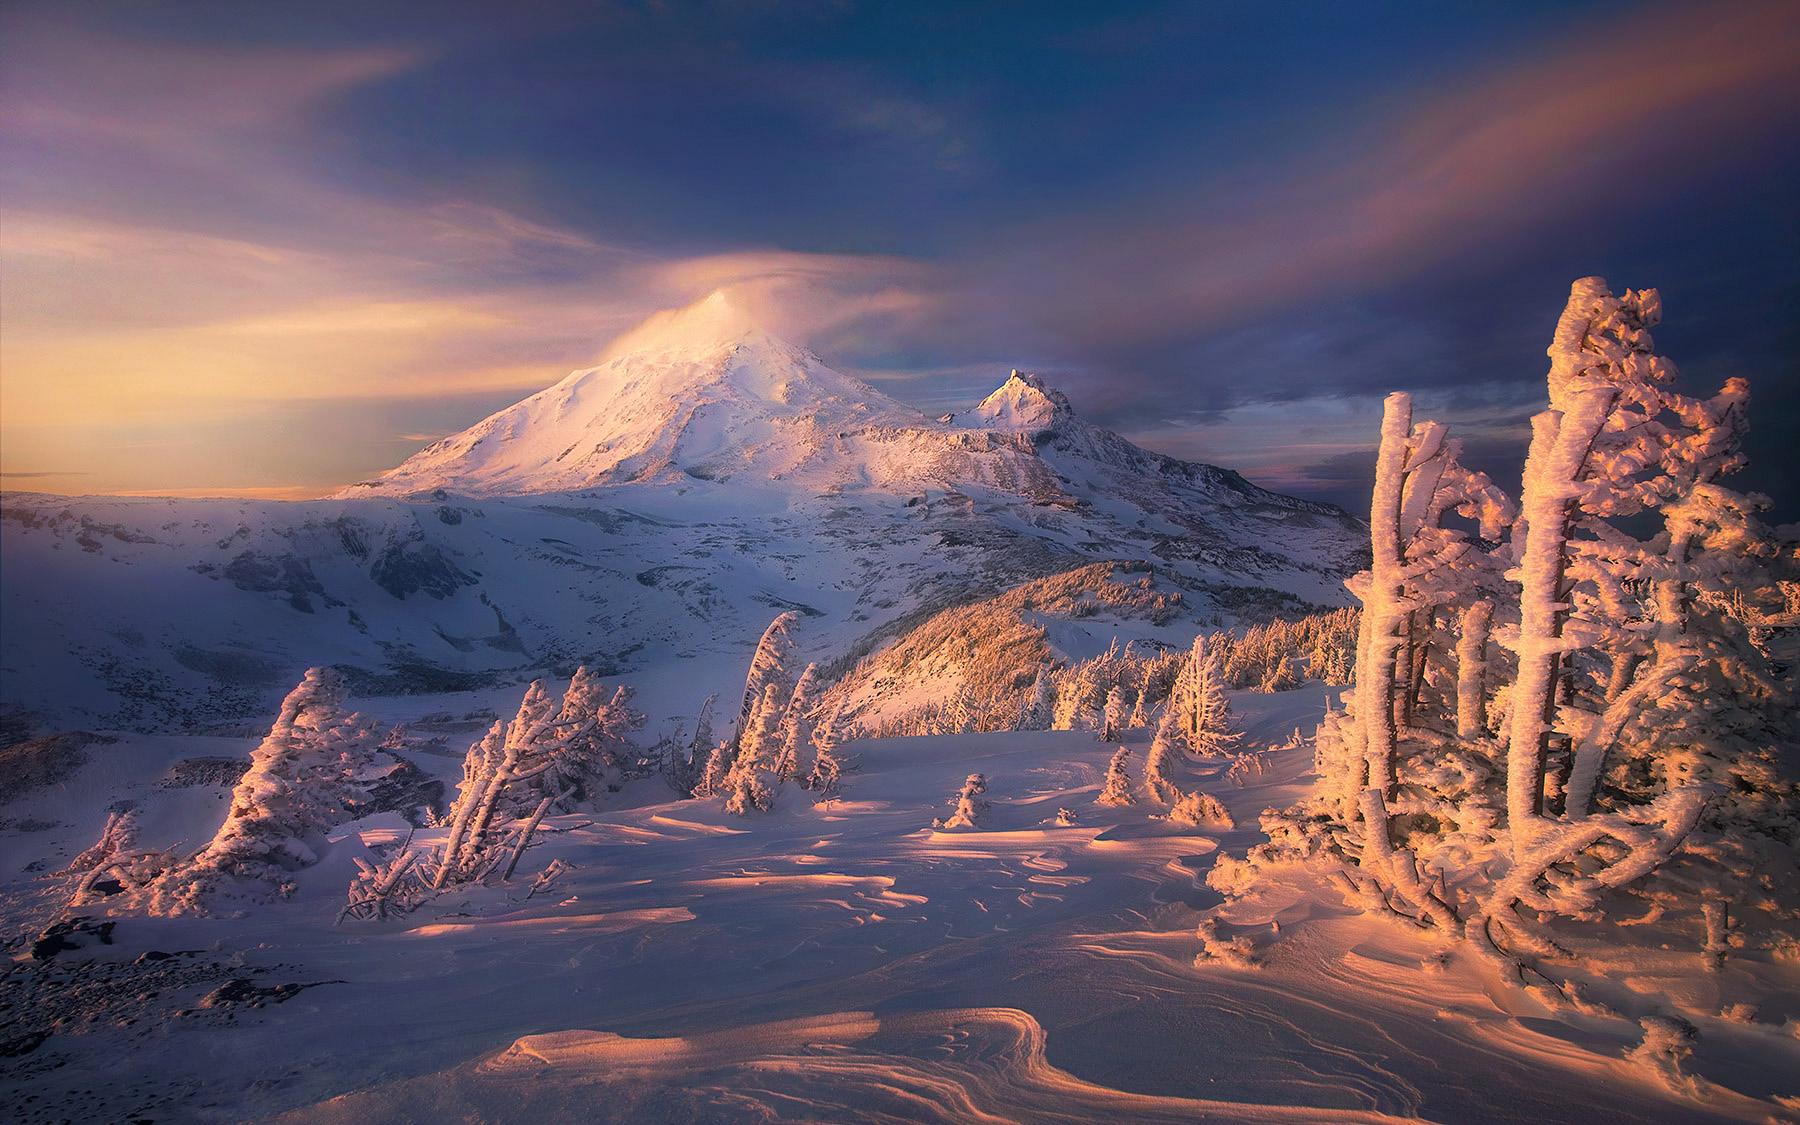 Colorado Fall Desktop Wallpaper Higher Calling Three Sisters Wilderness Oregon Marc